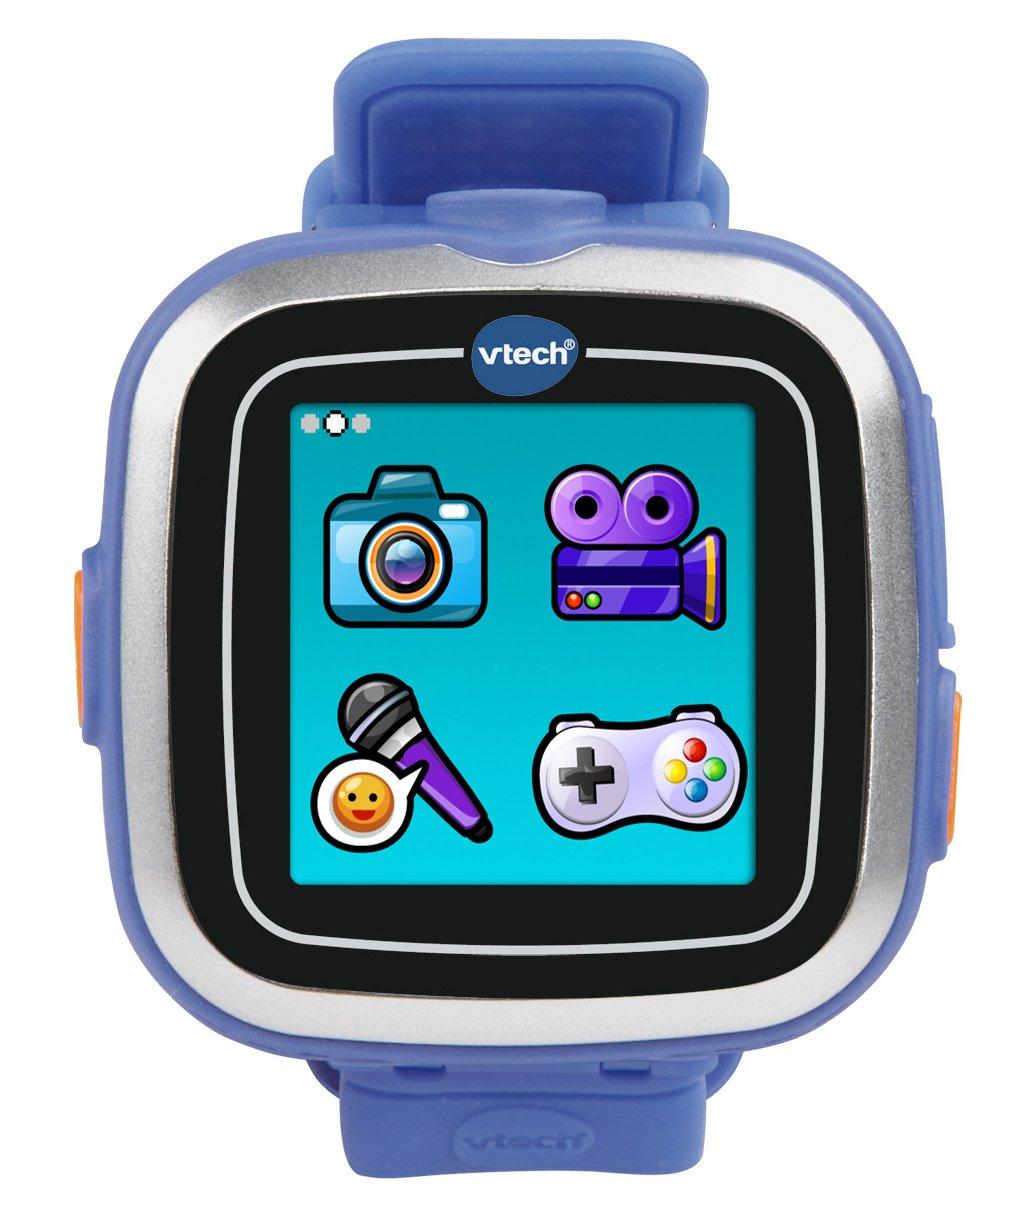 VTech Kidizoom Smartwatch, azul: Amazon.es: Bebé